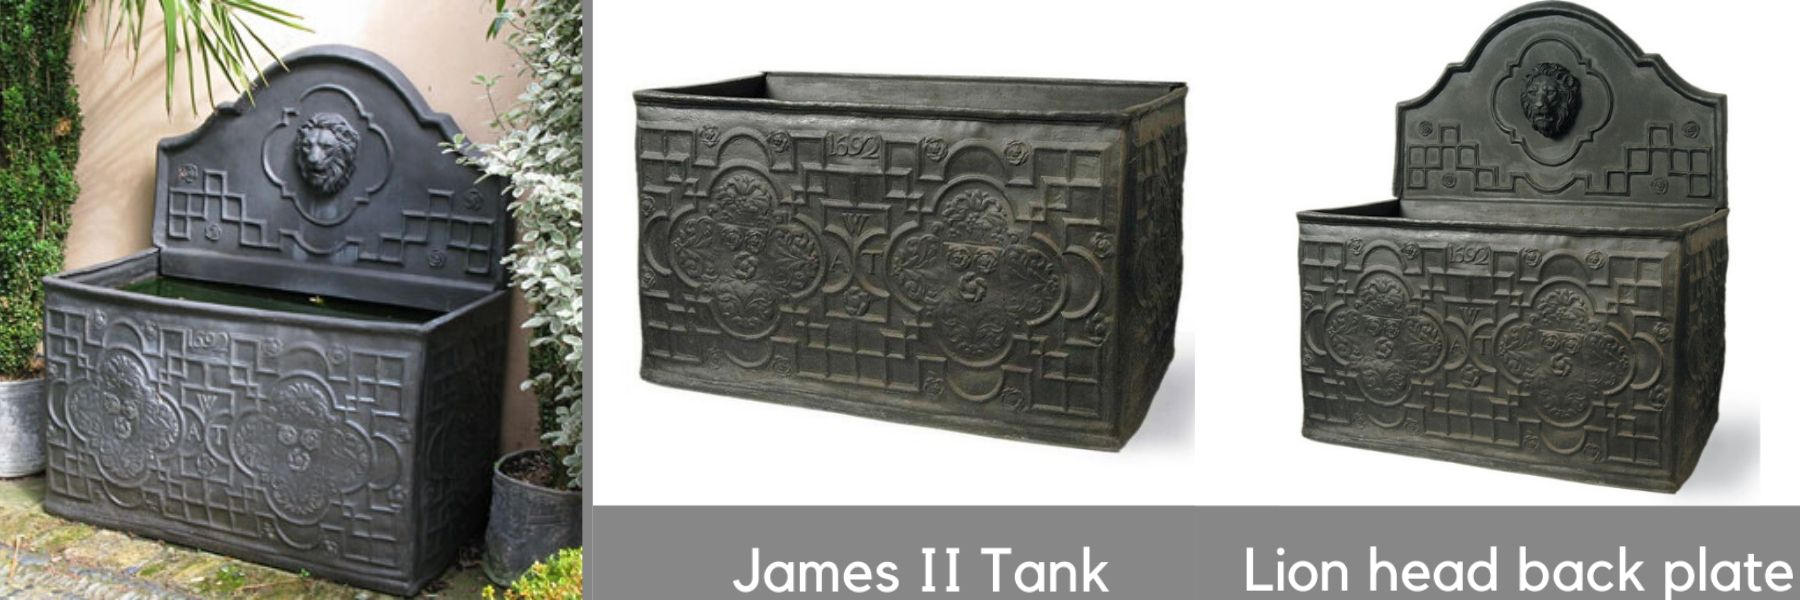 jamesii-water-tank-fountain-capital-garden